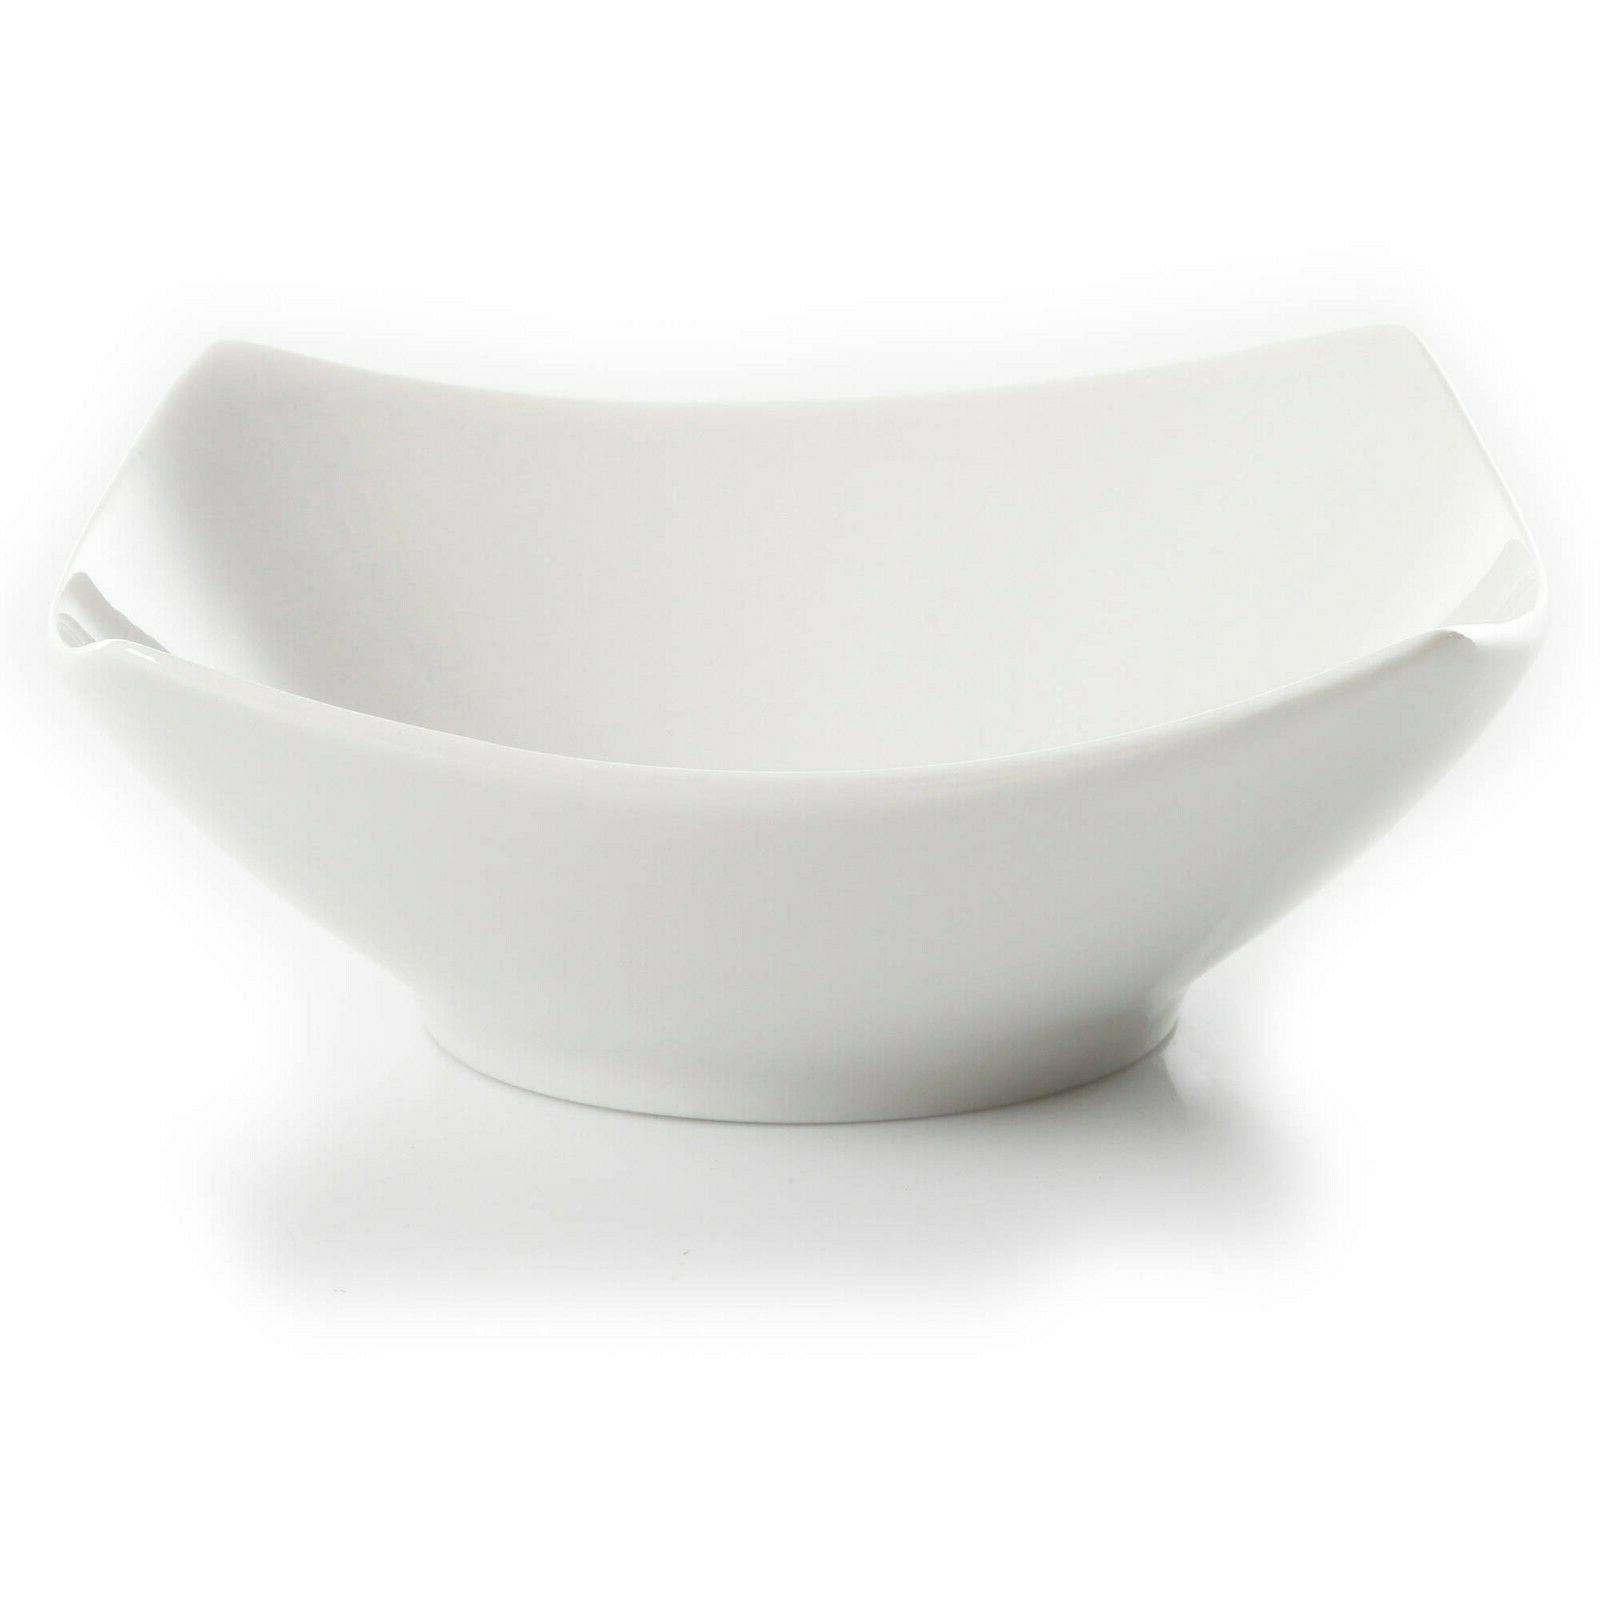 12-Piece Square Dinner Bowls Ceramic White